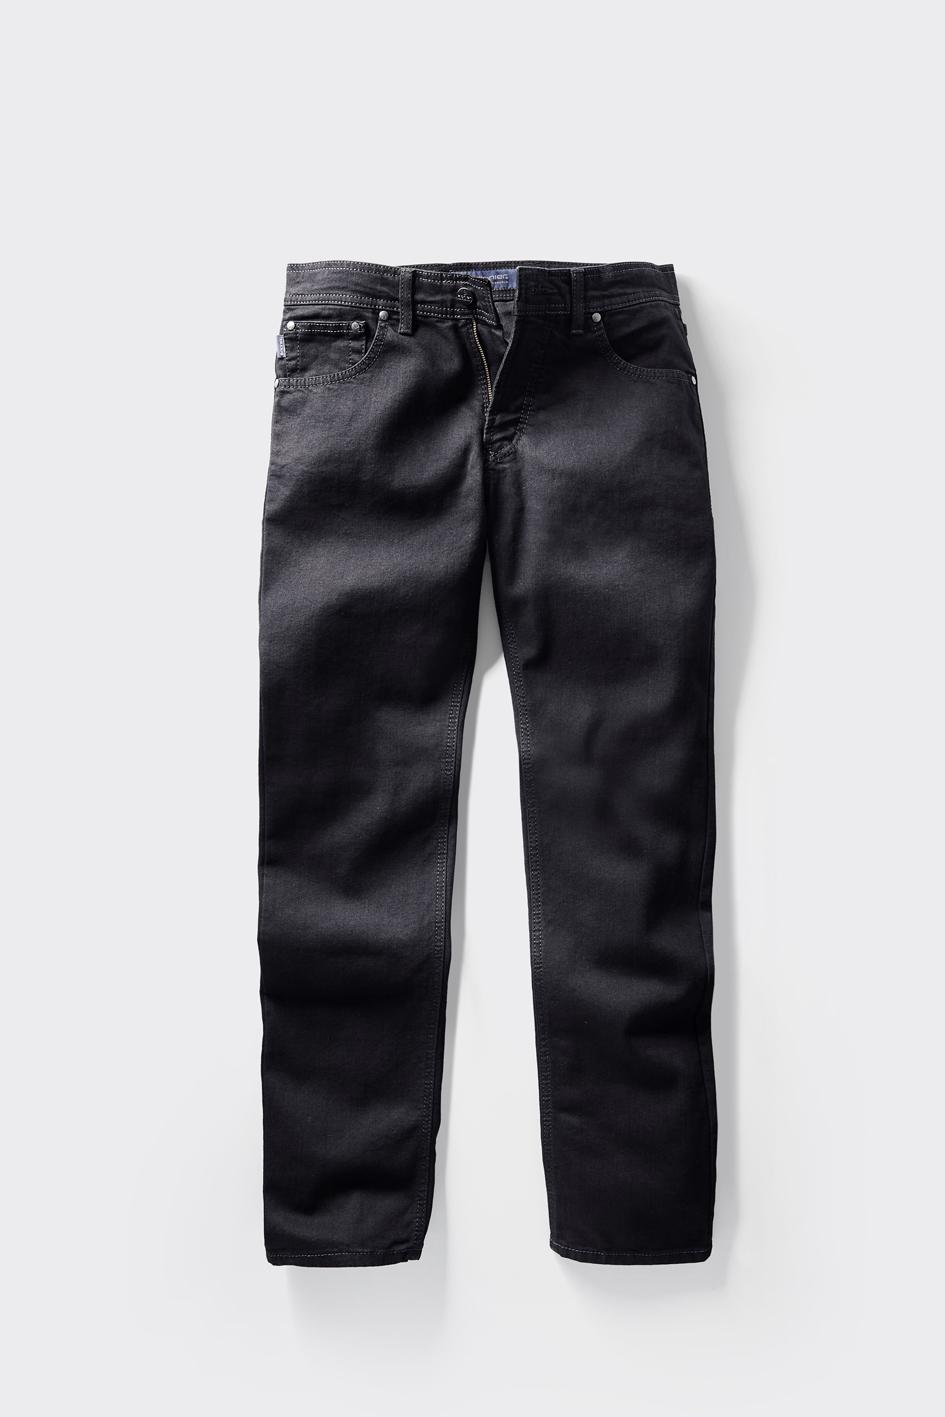 Pionier Jeans Marc extra lang schwarz